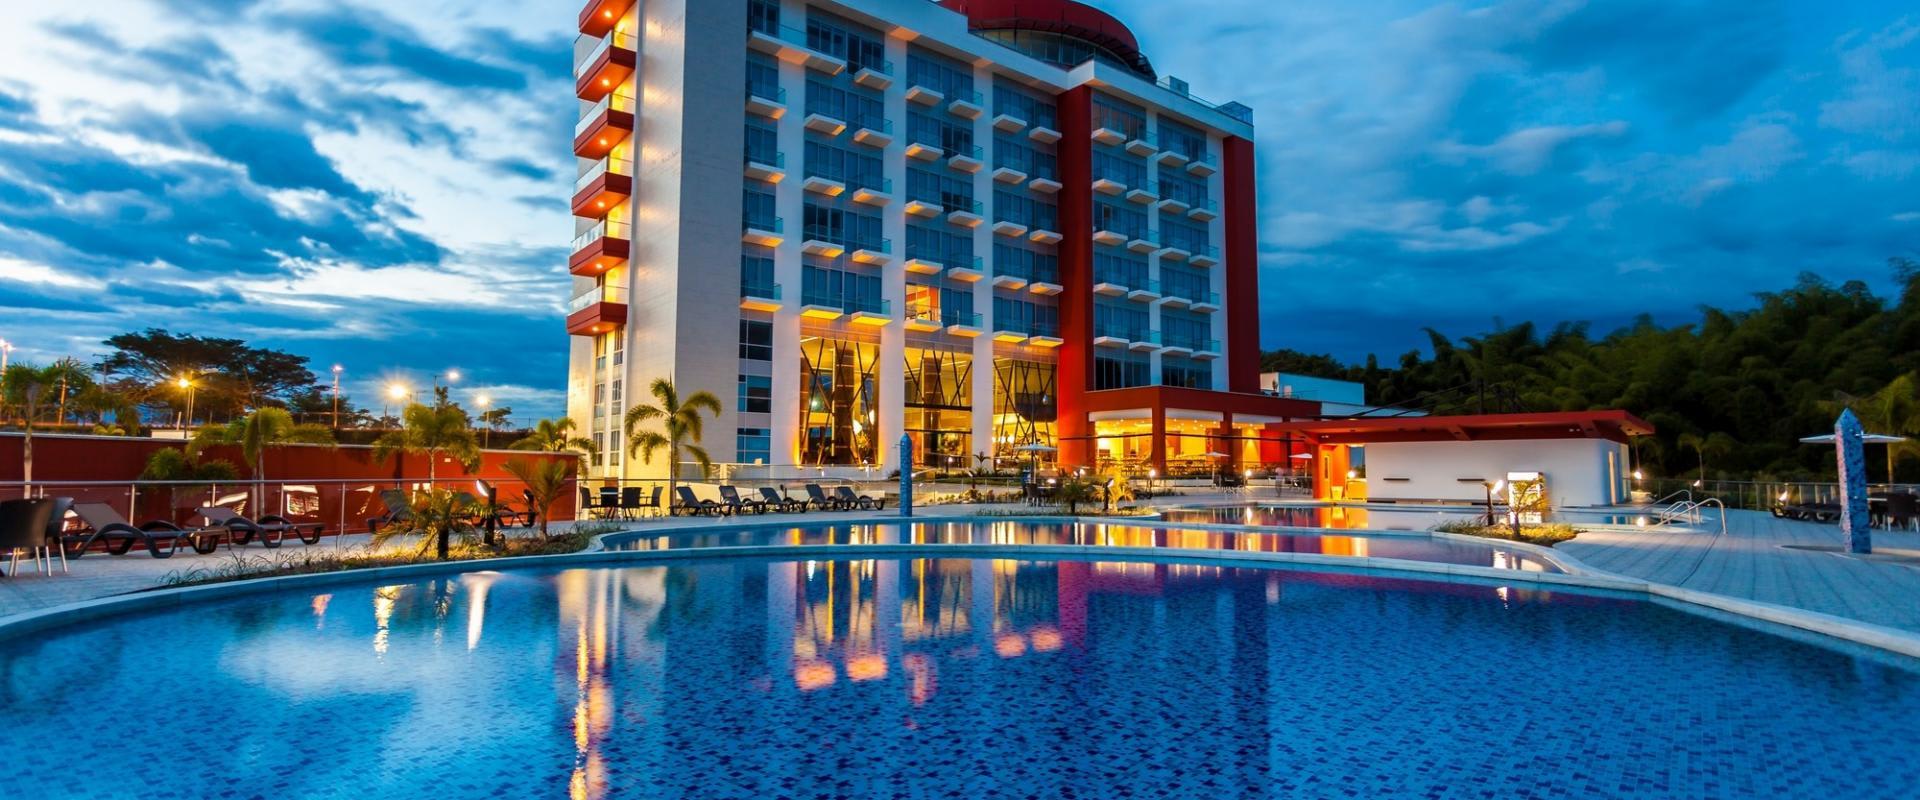 Sonesta Hotel Pereira - Pool